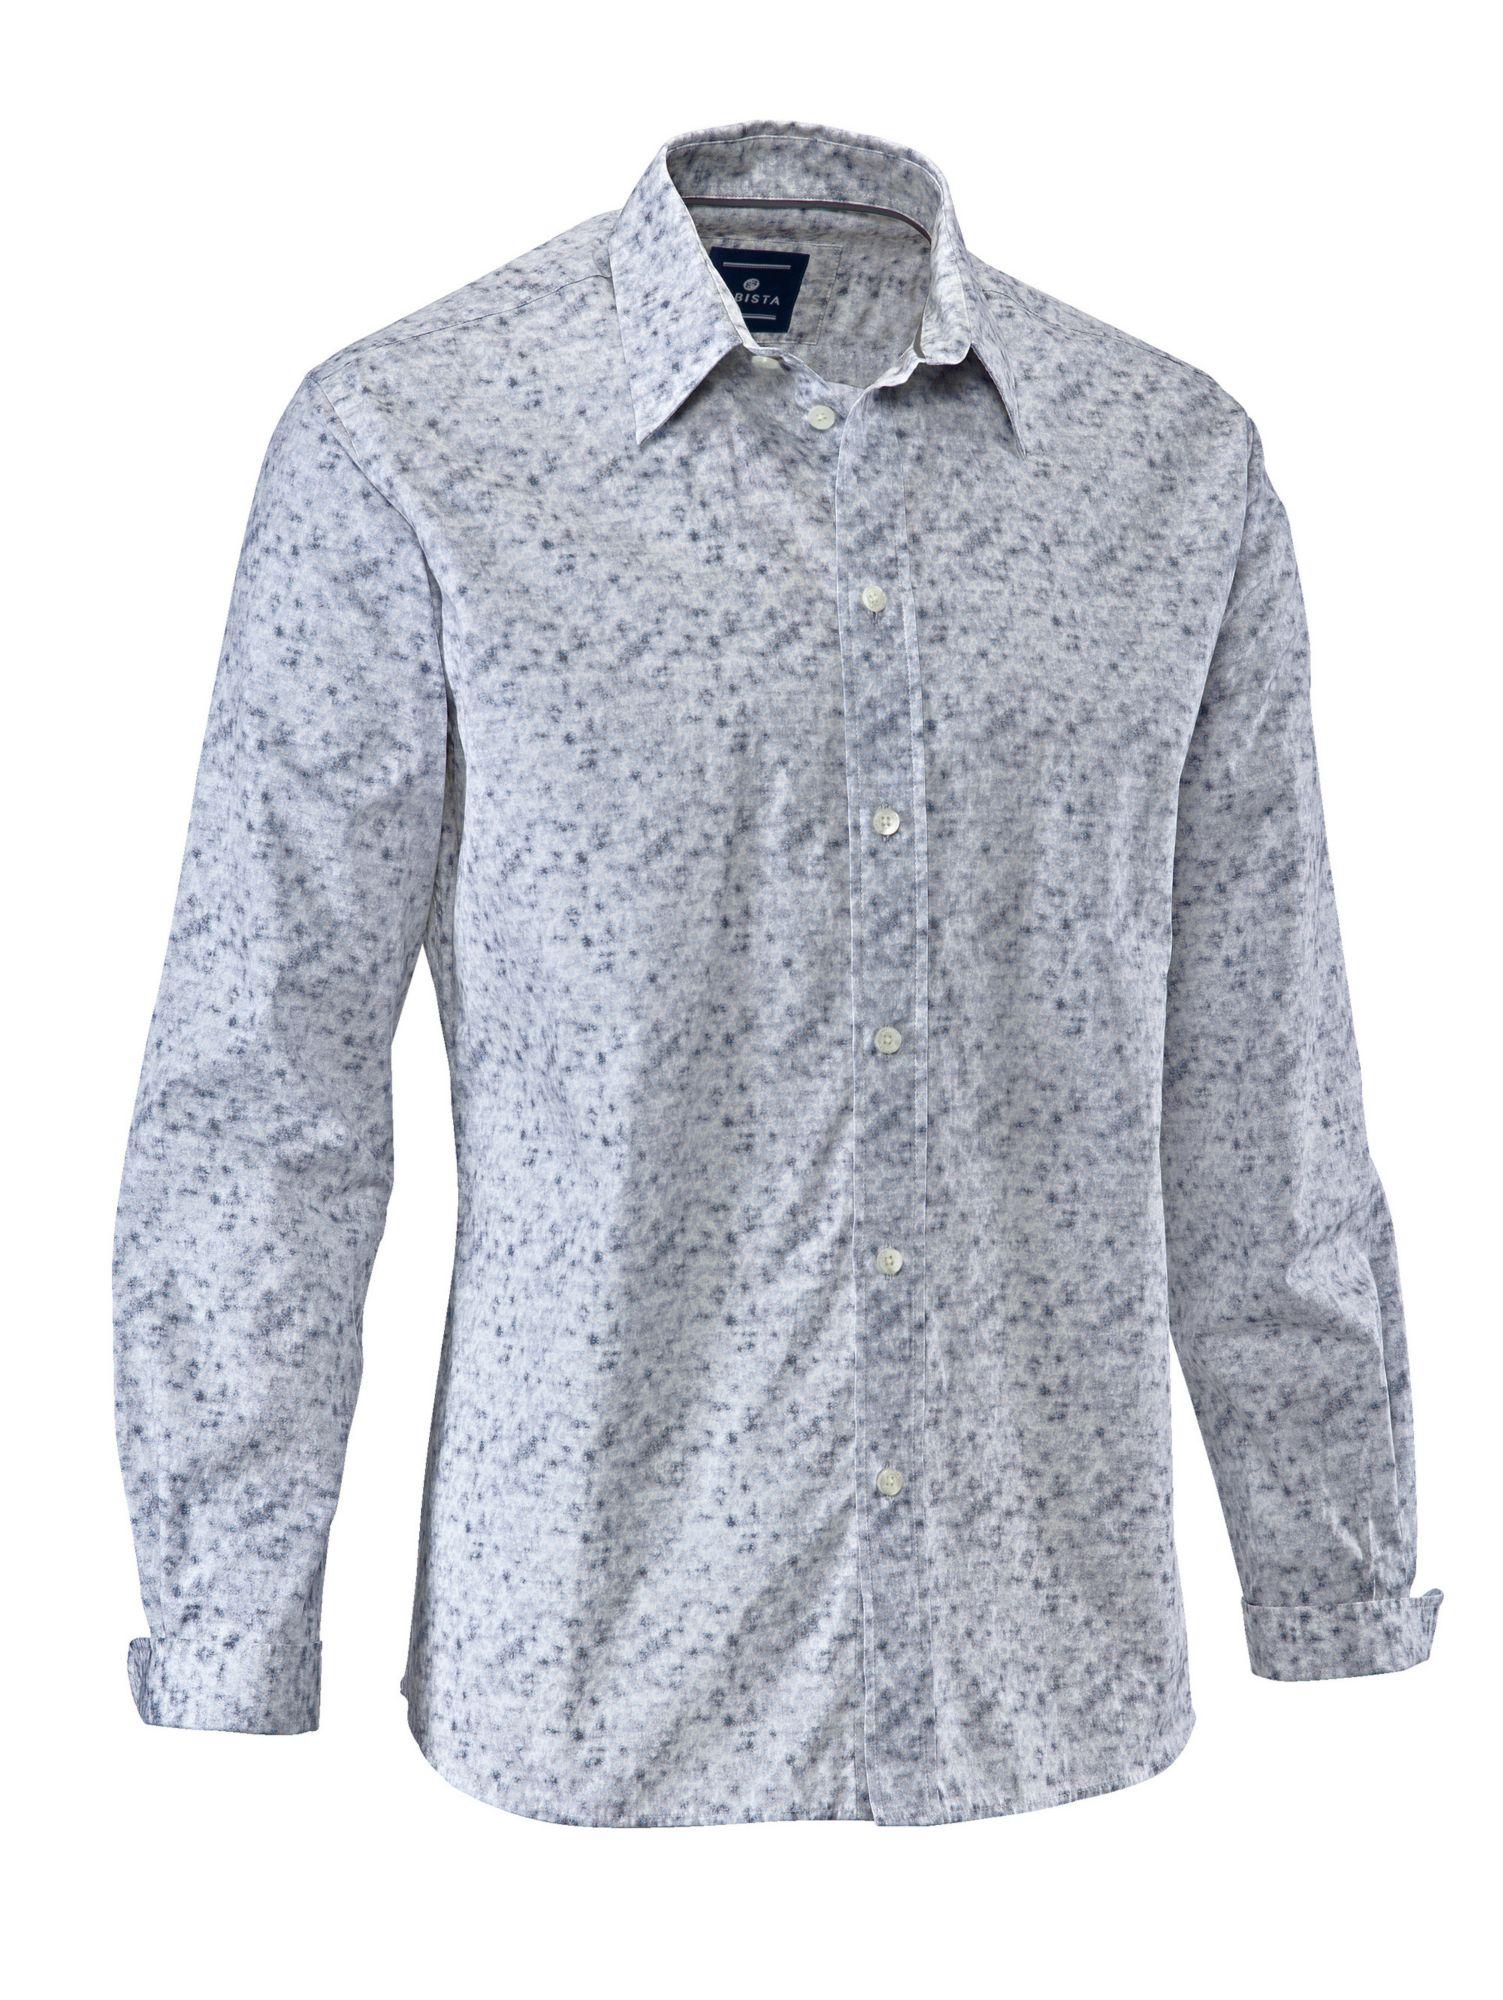 BABISTA Babista Hemd mit dezentem Druckmuster